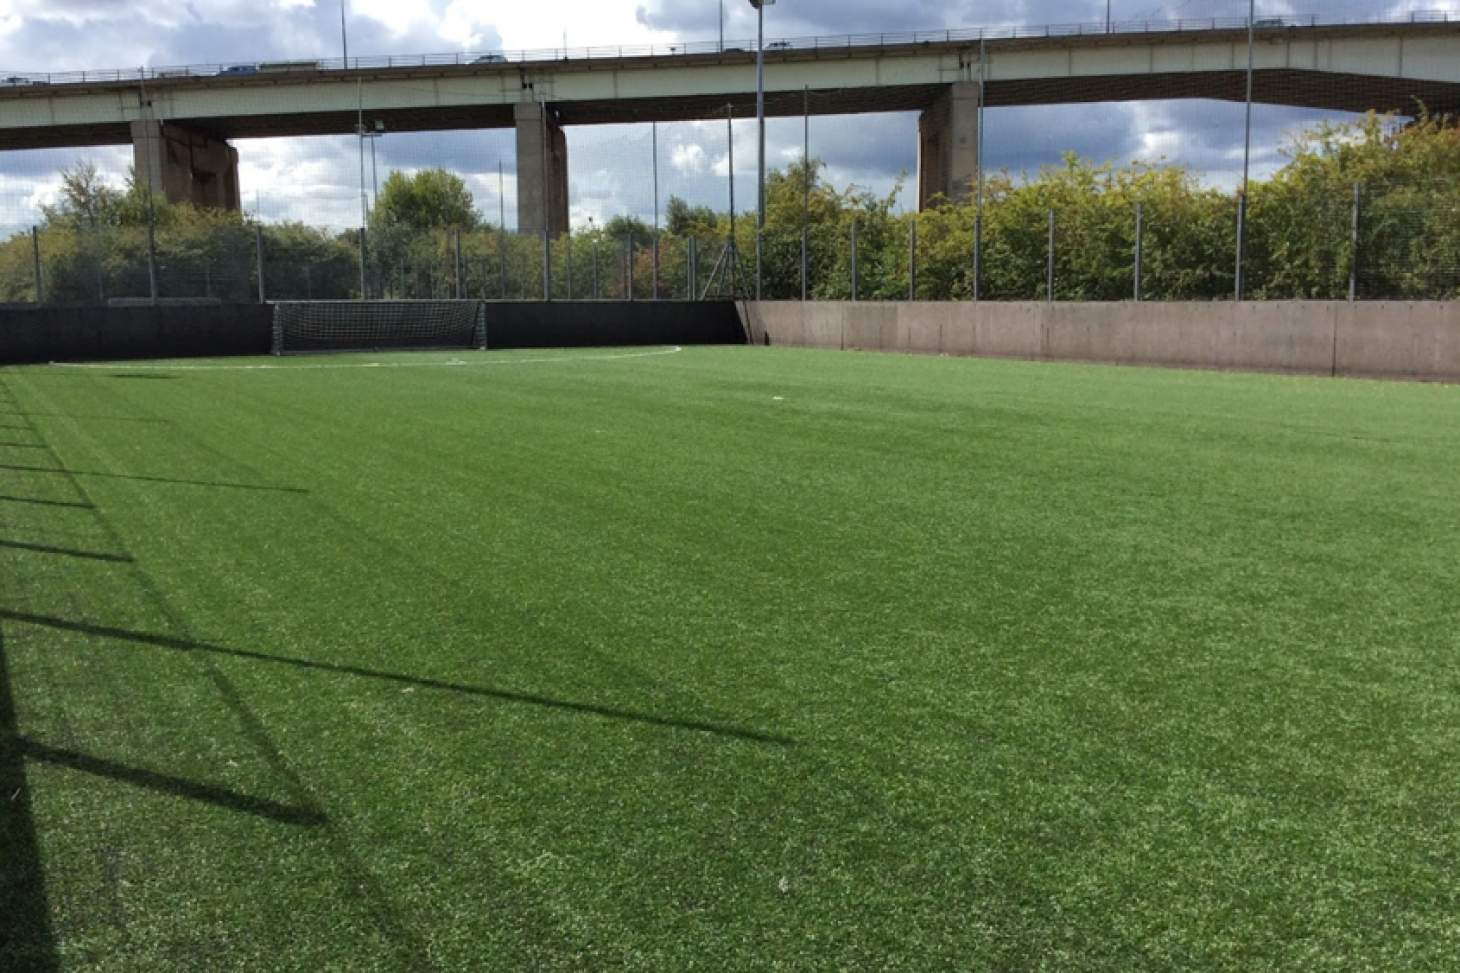 Powerleague Glasgow 5 a side | 3G Astroturf football pitch